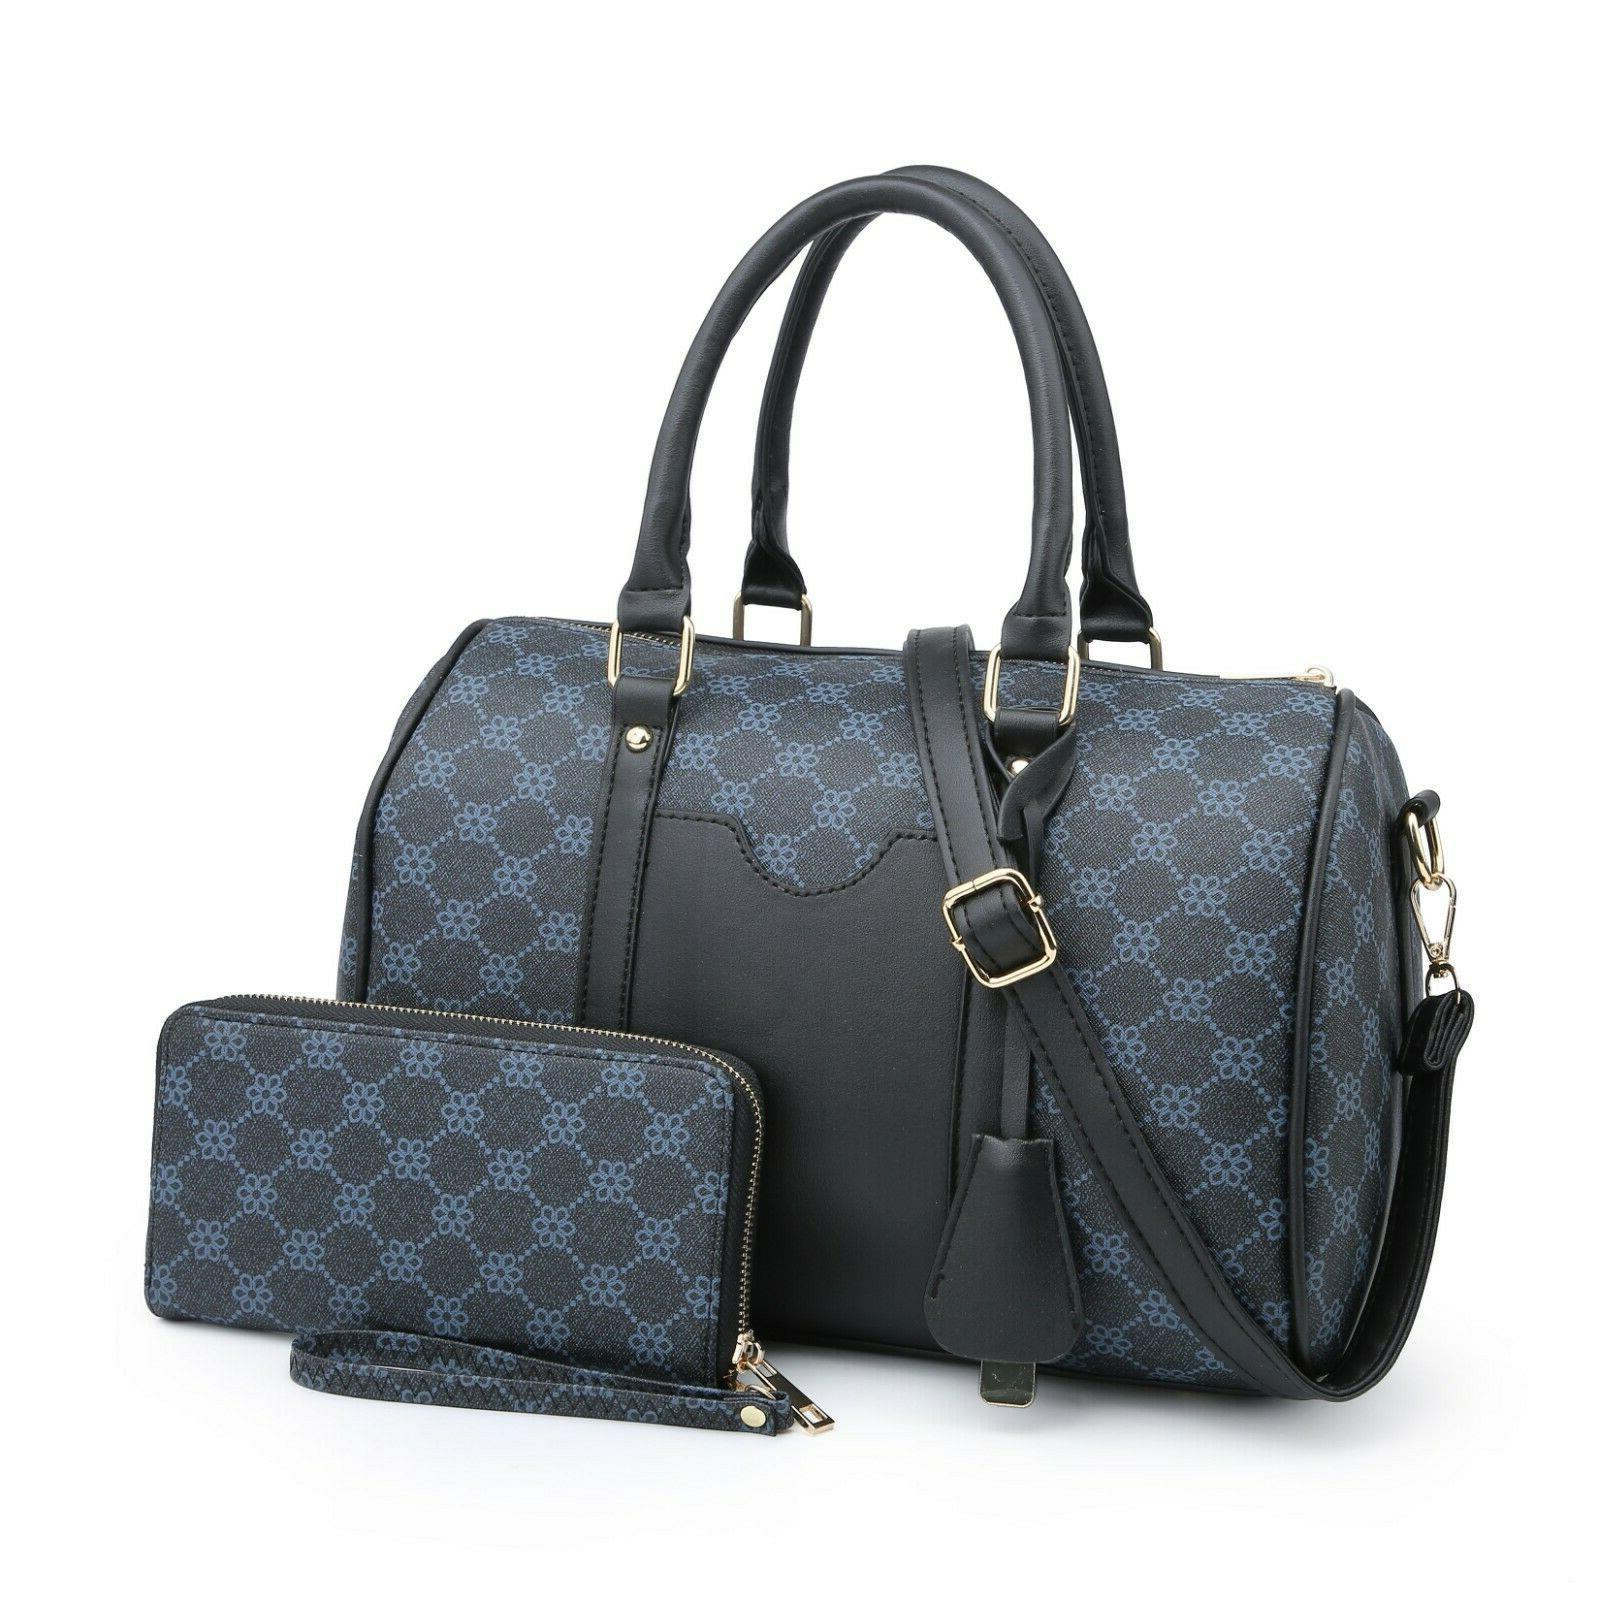 Women's Shoulder Bag Set